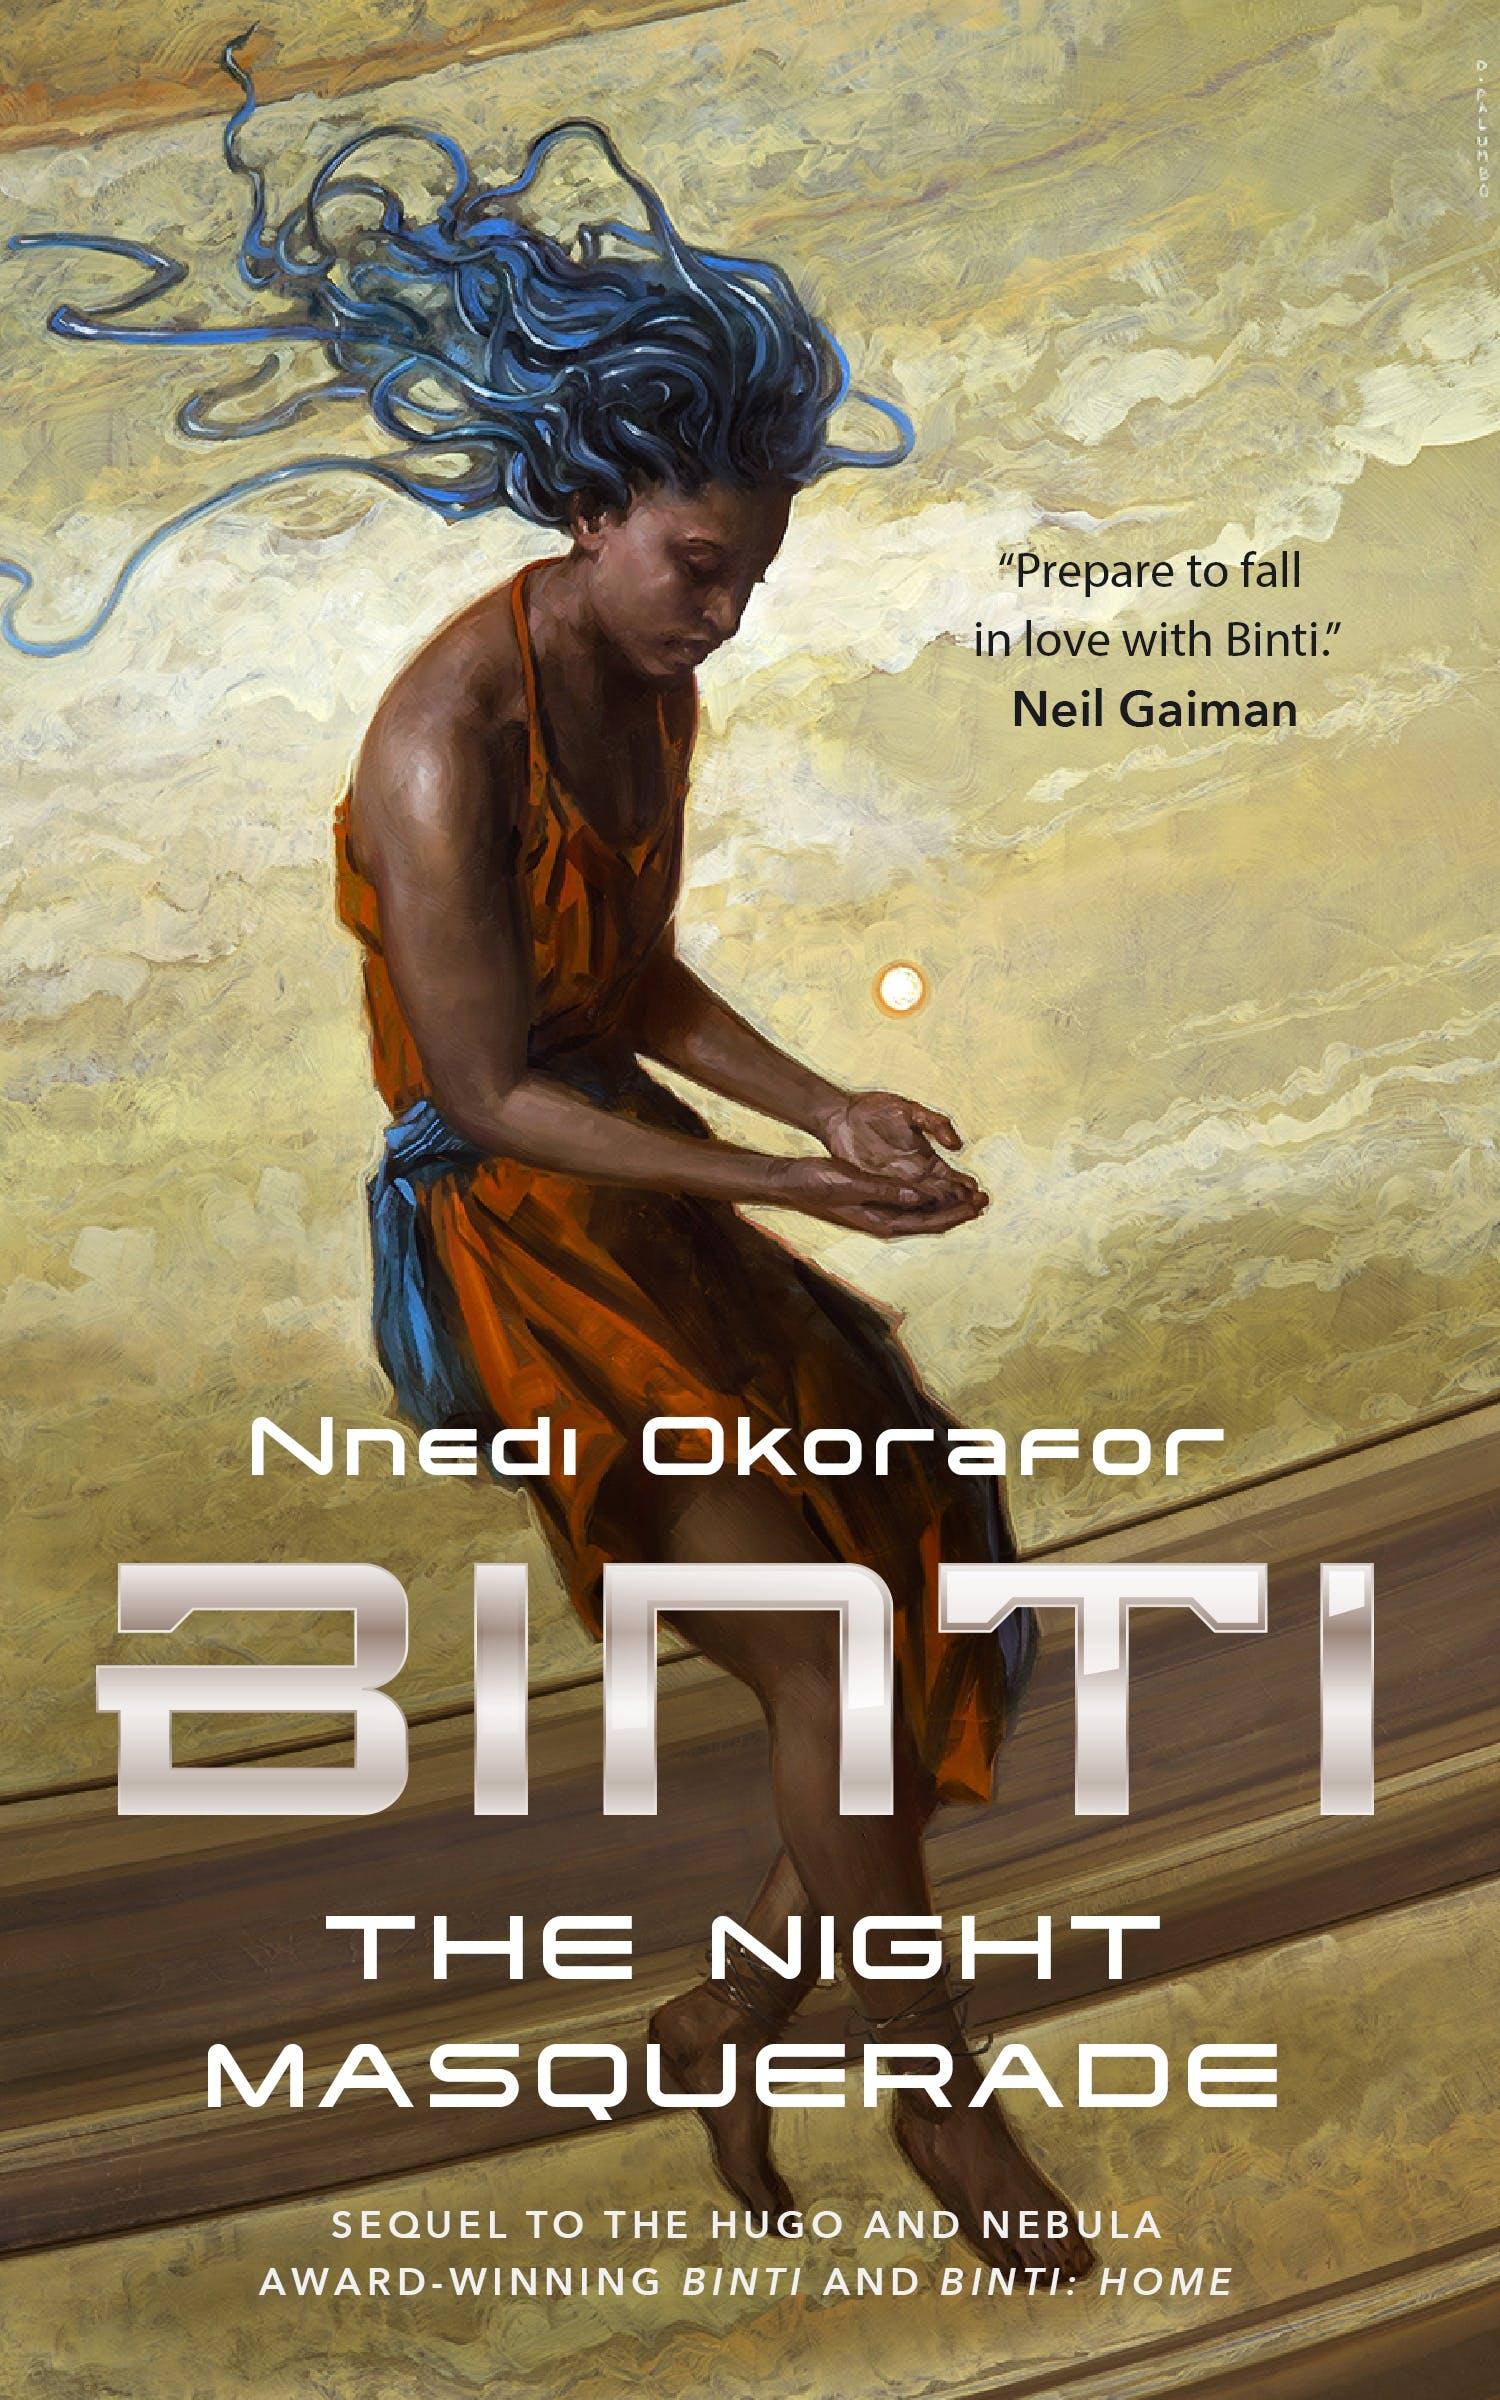 Image of Binti: The Night Masquerade